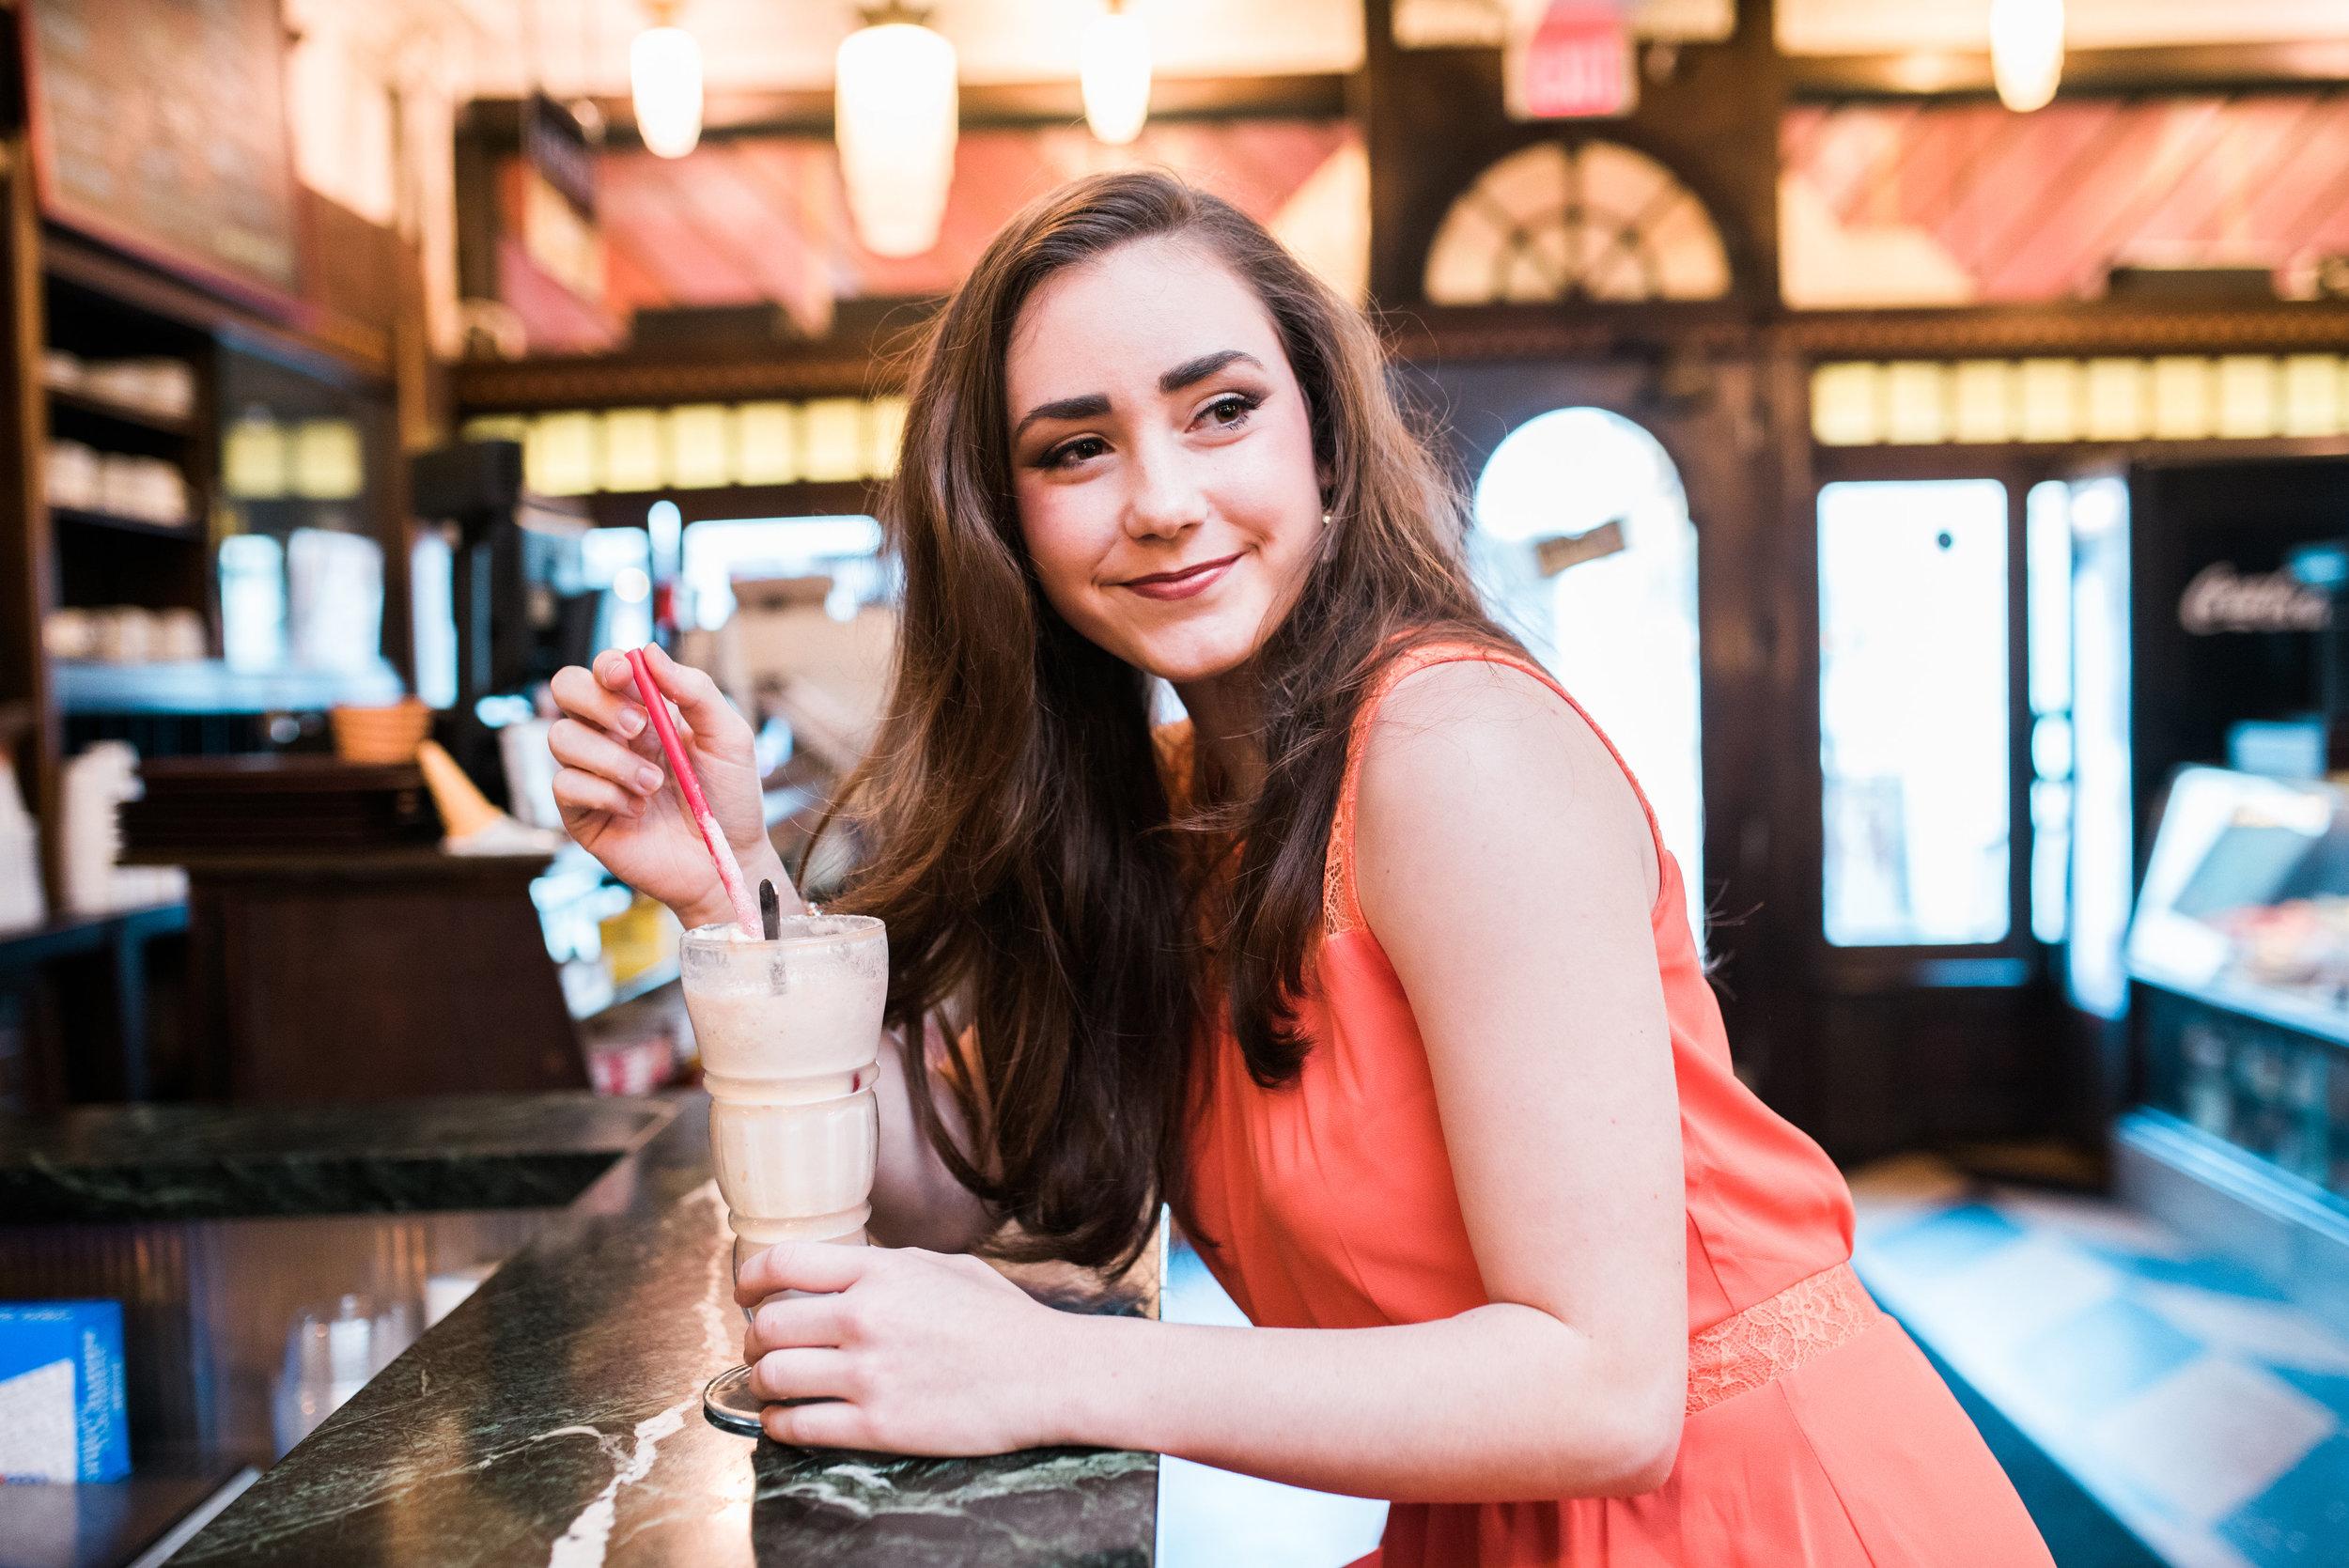 pittsburgh senior portrait, senior pictures, high school